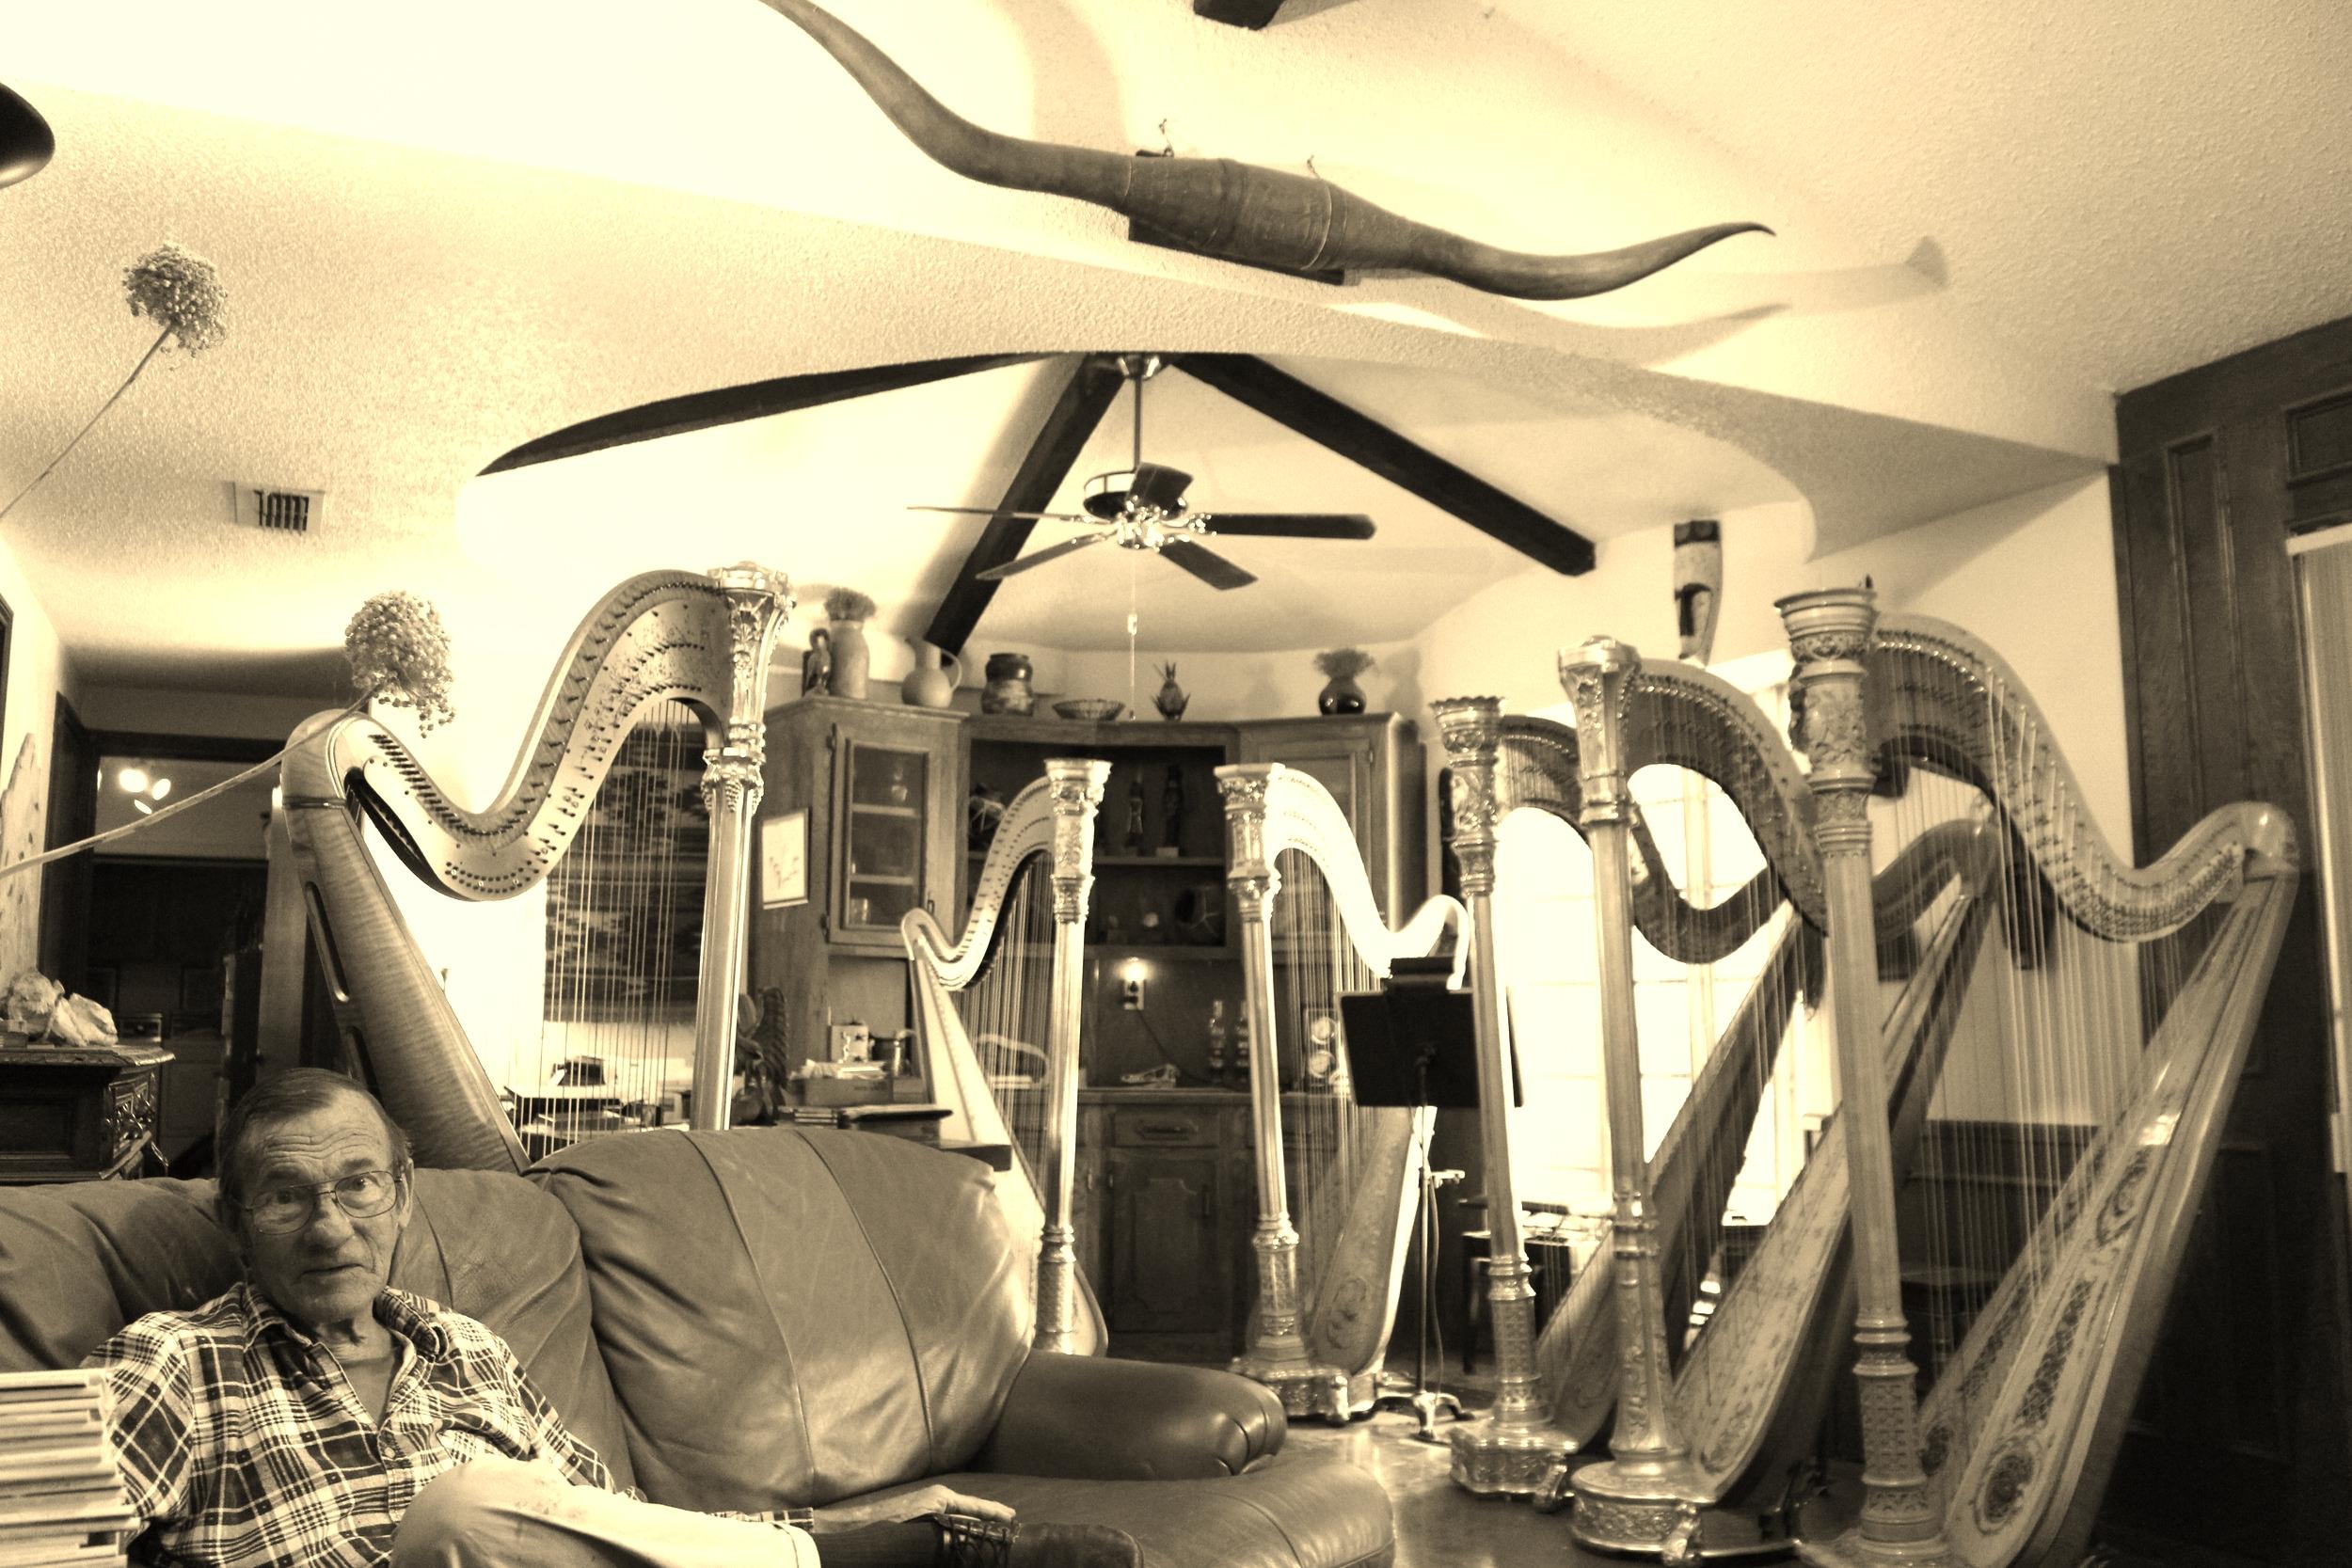 An unusual living room!